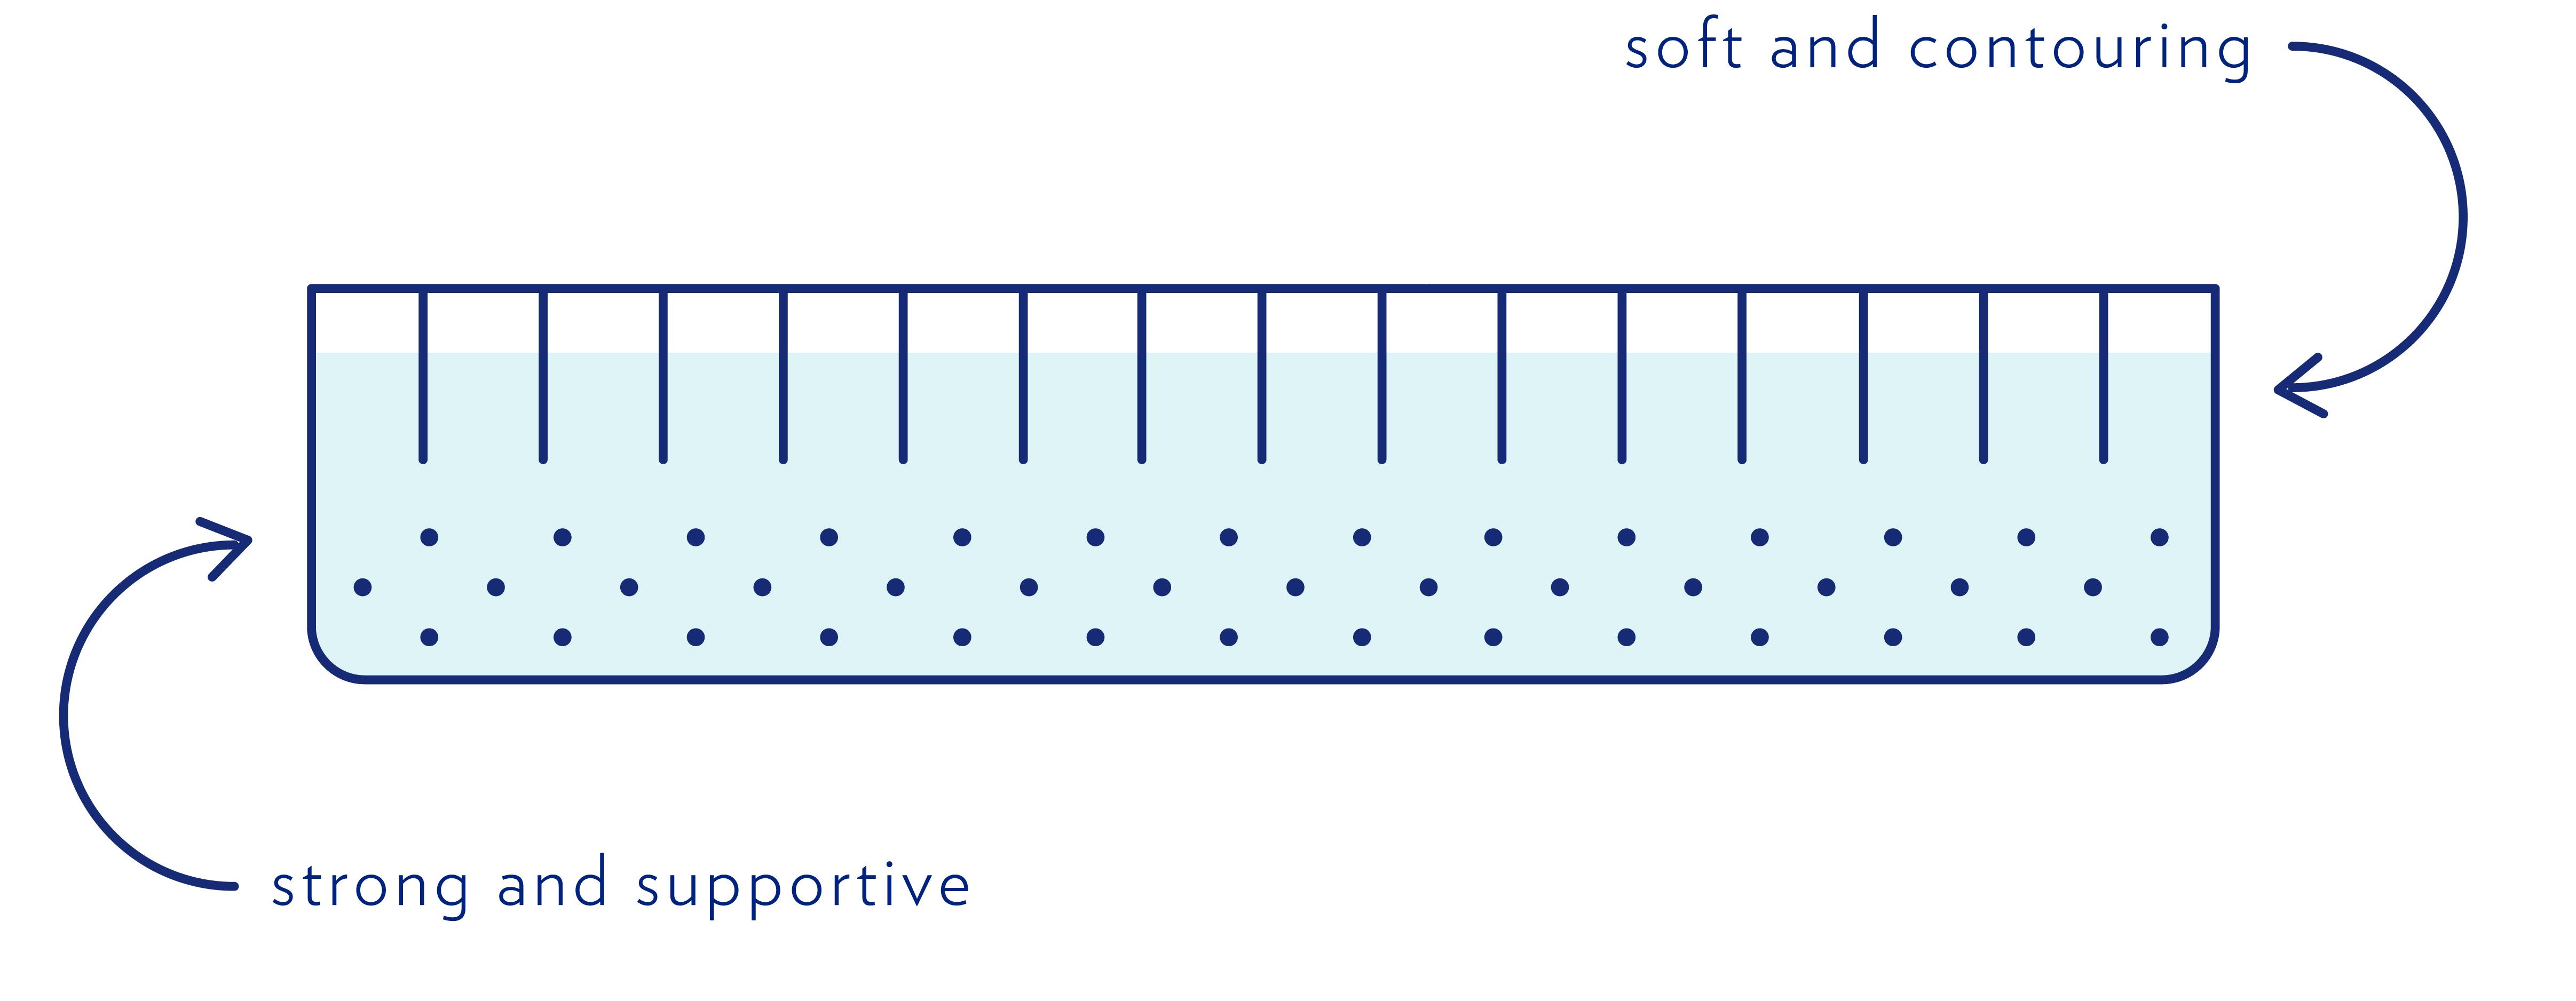 4826x1876 Types Of Mattresses A Casper Mattress Comparison